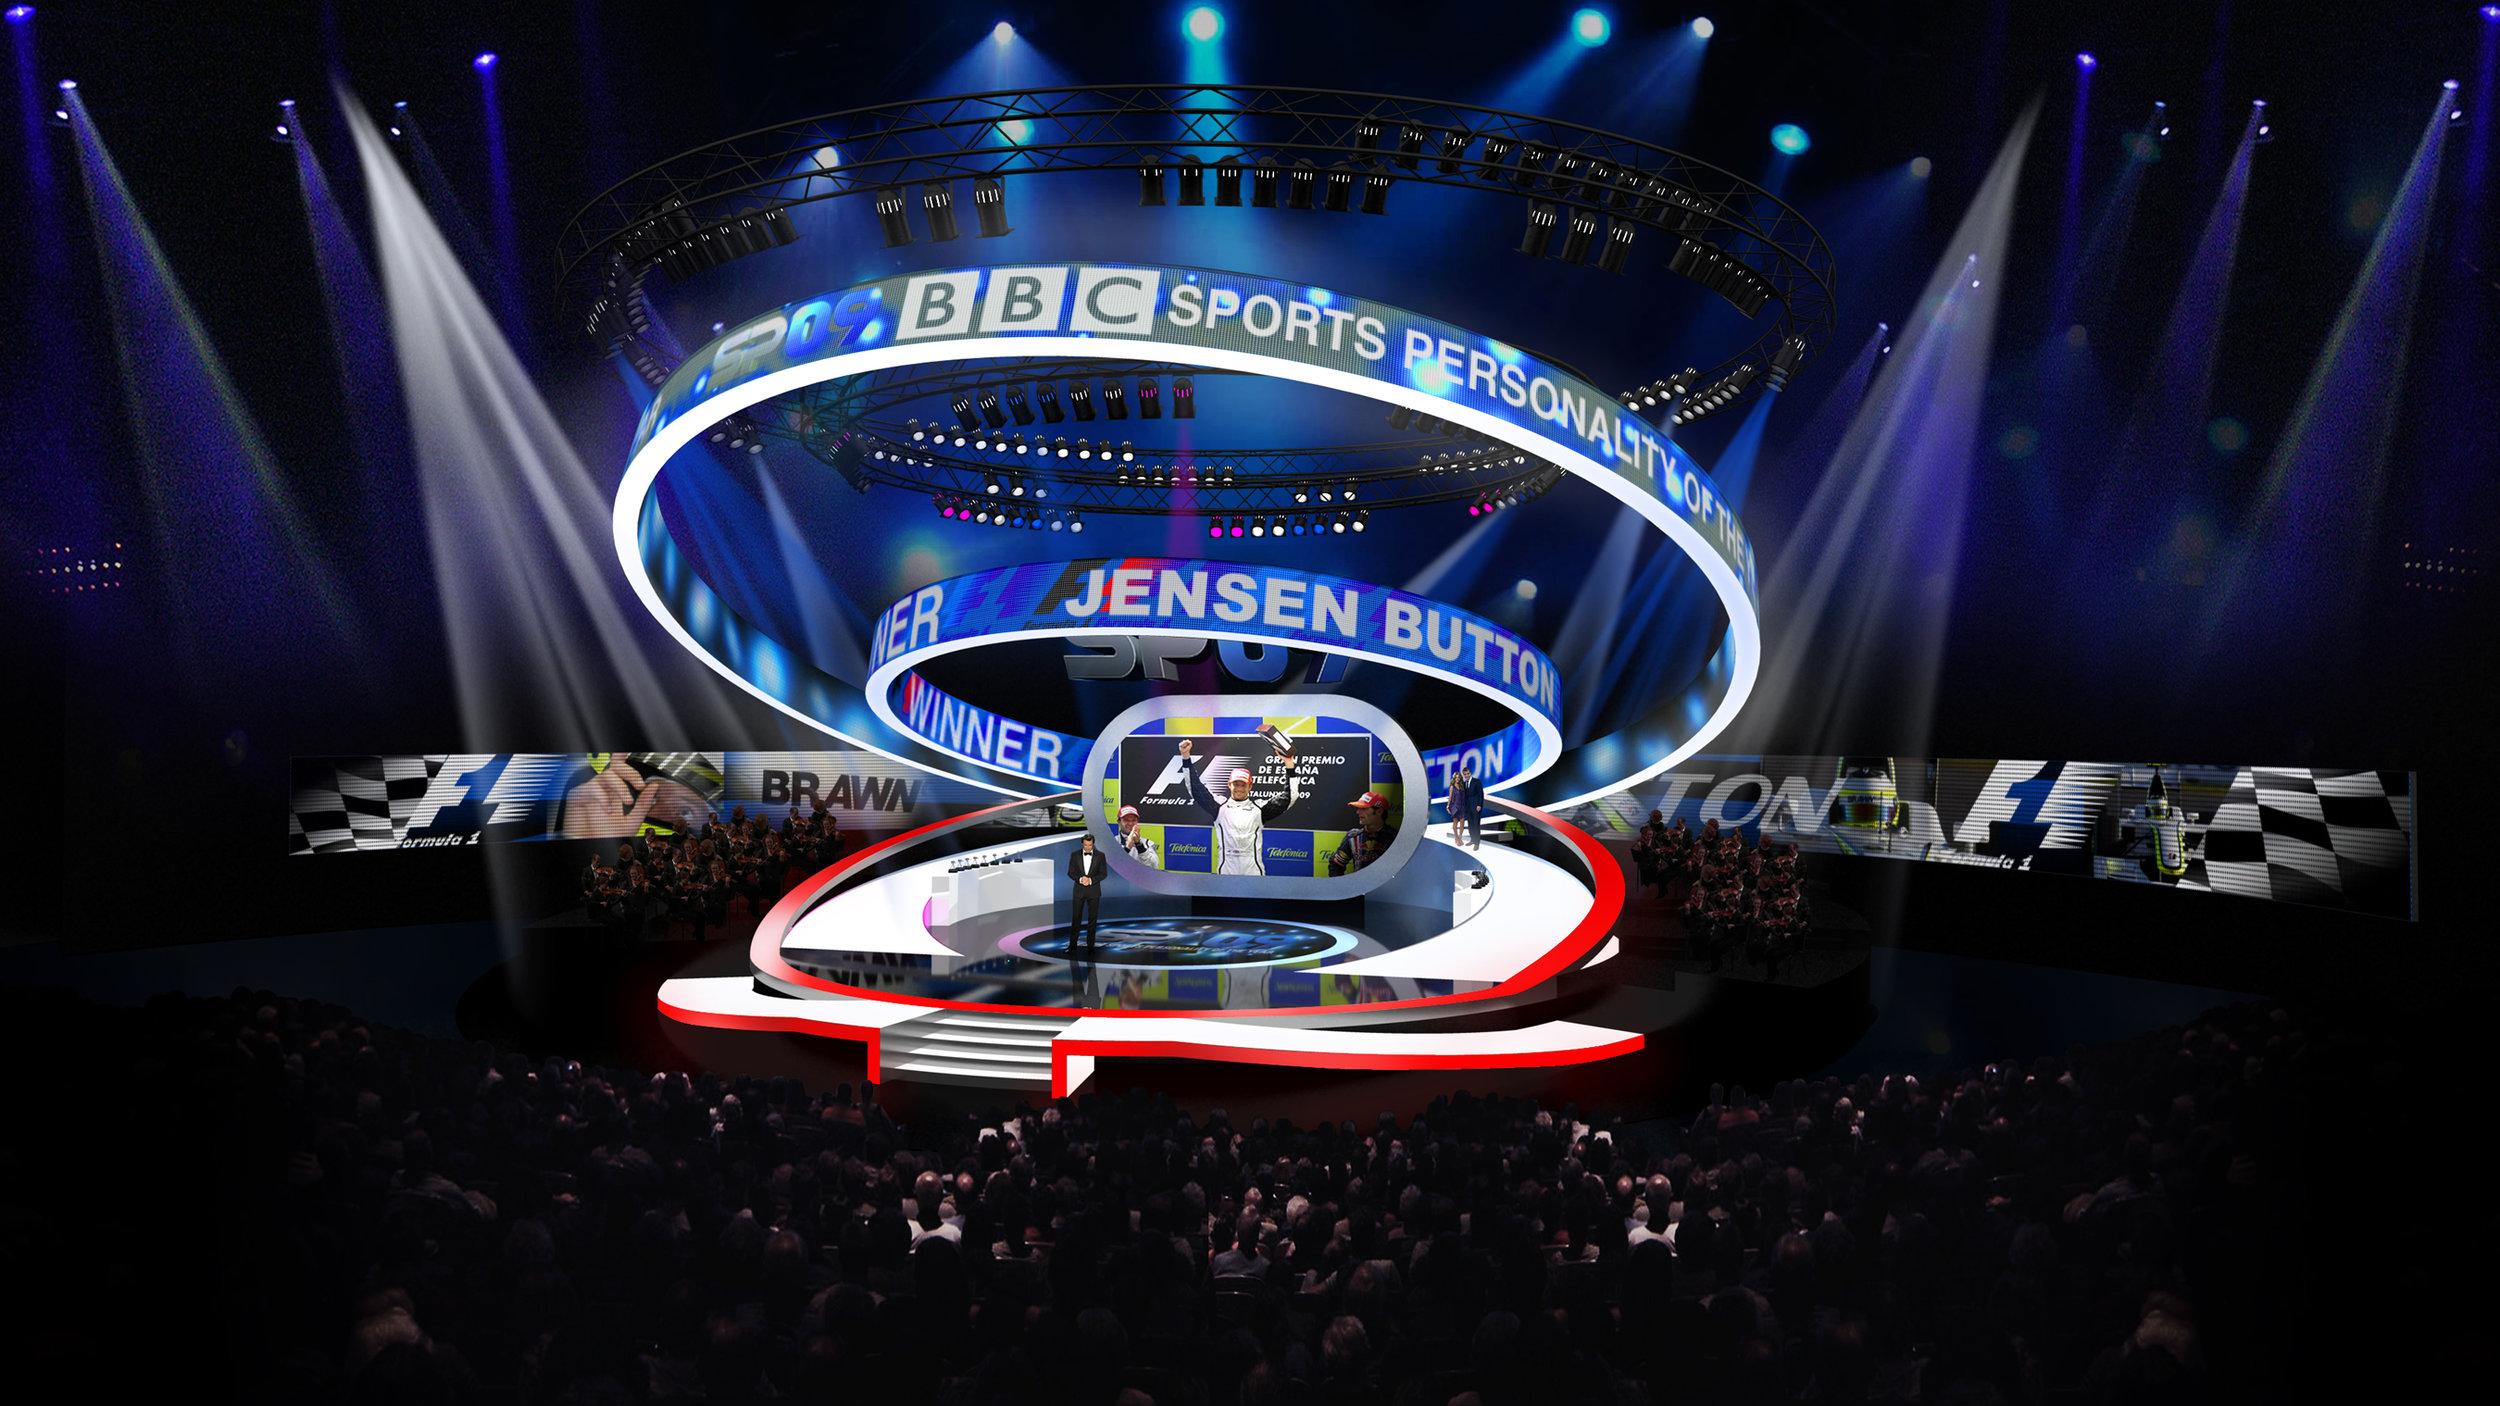 BBC Sports Personality